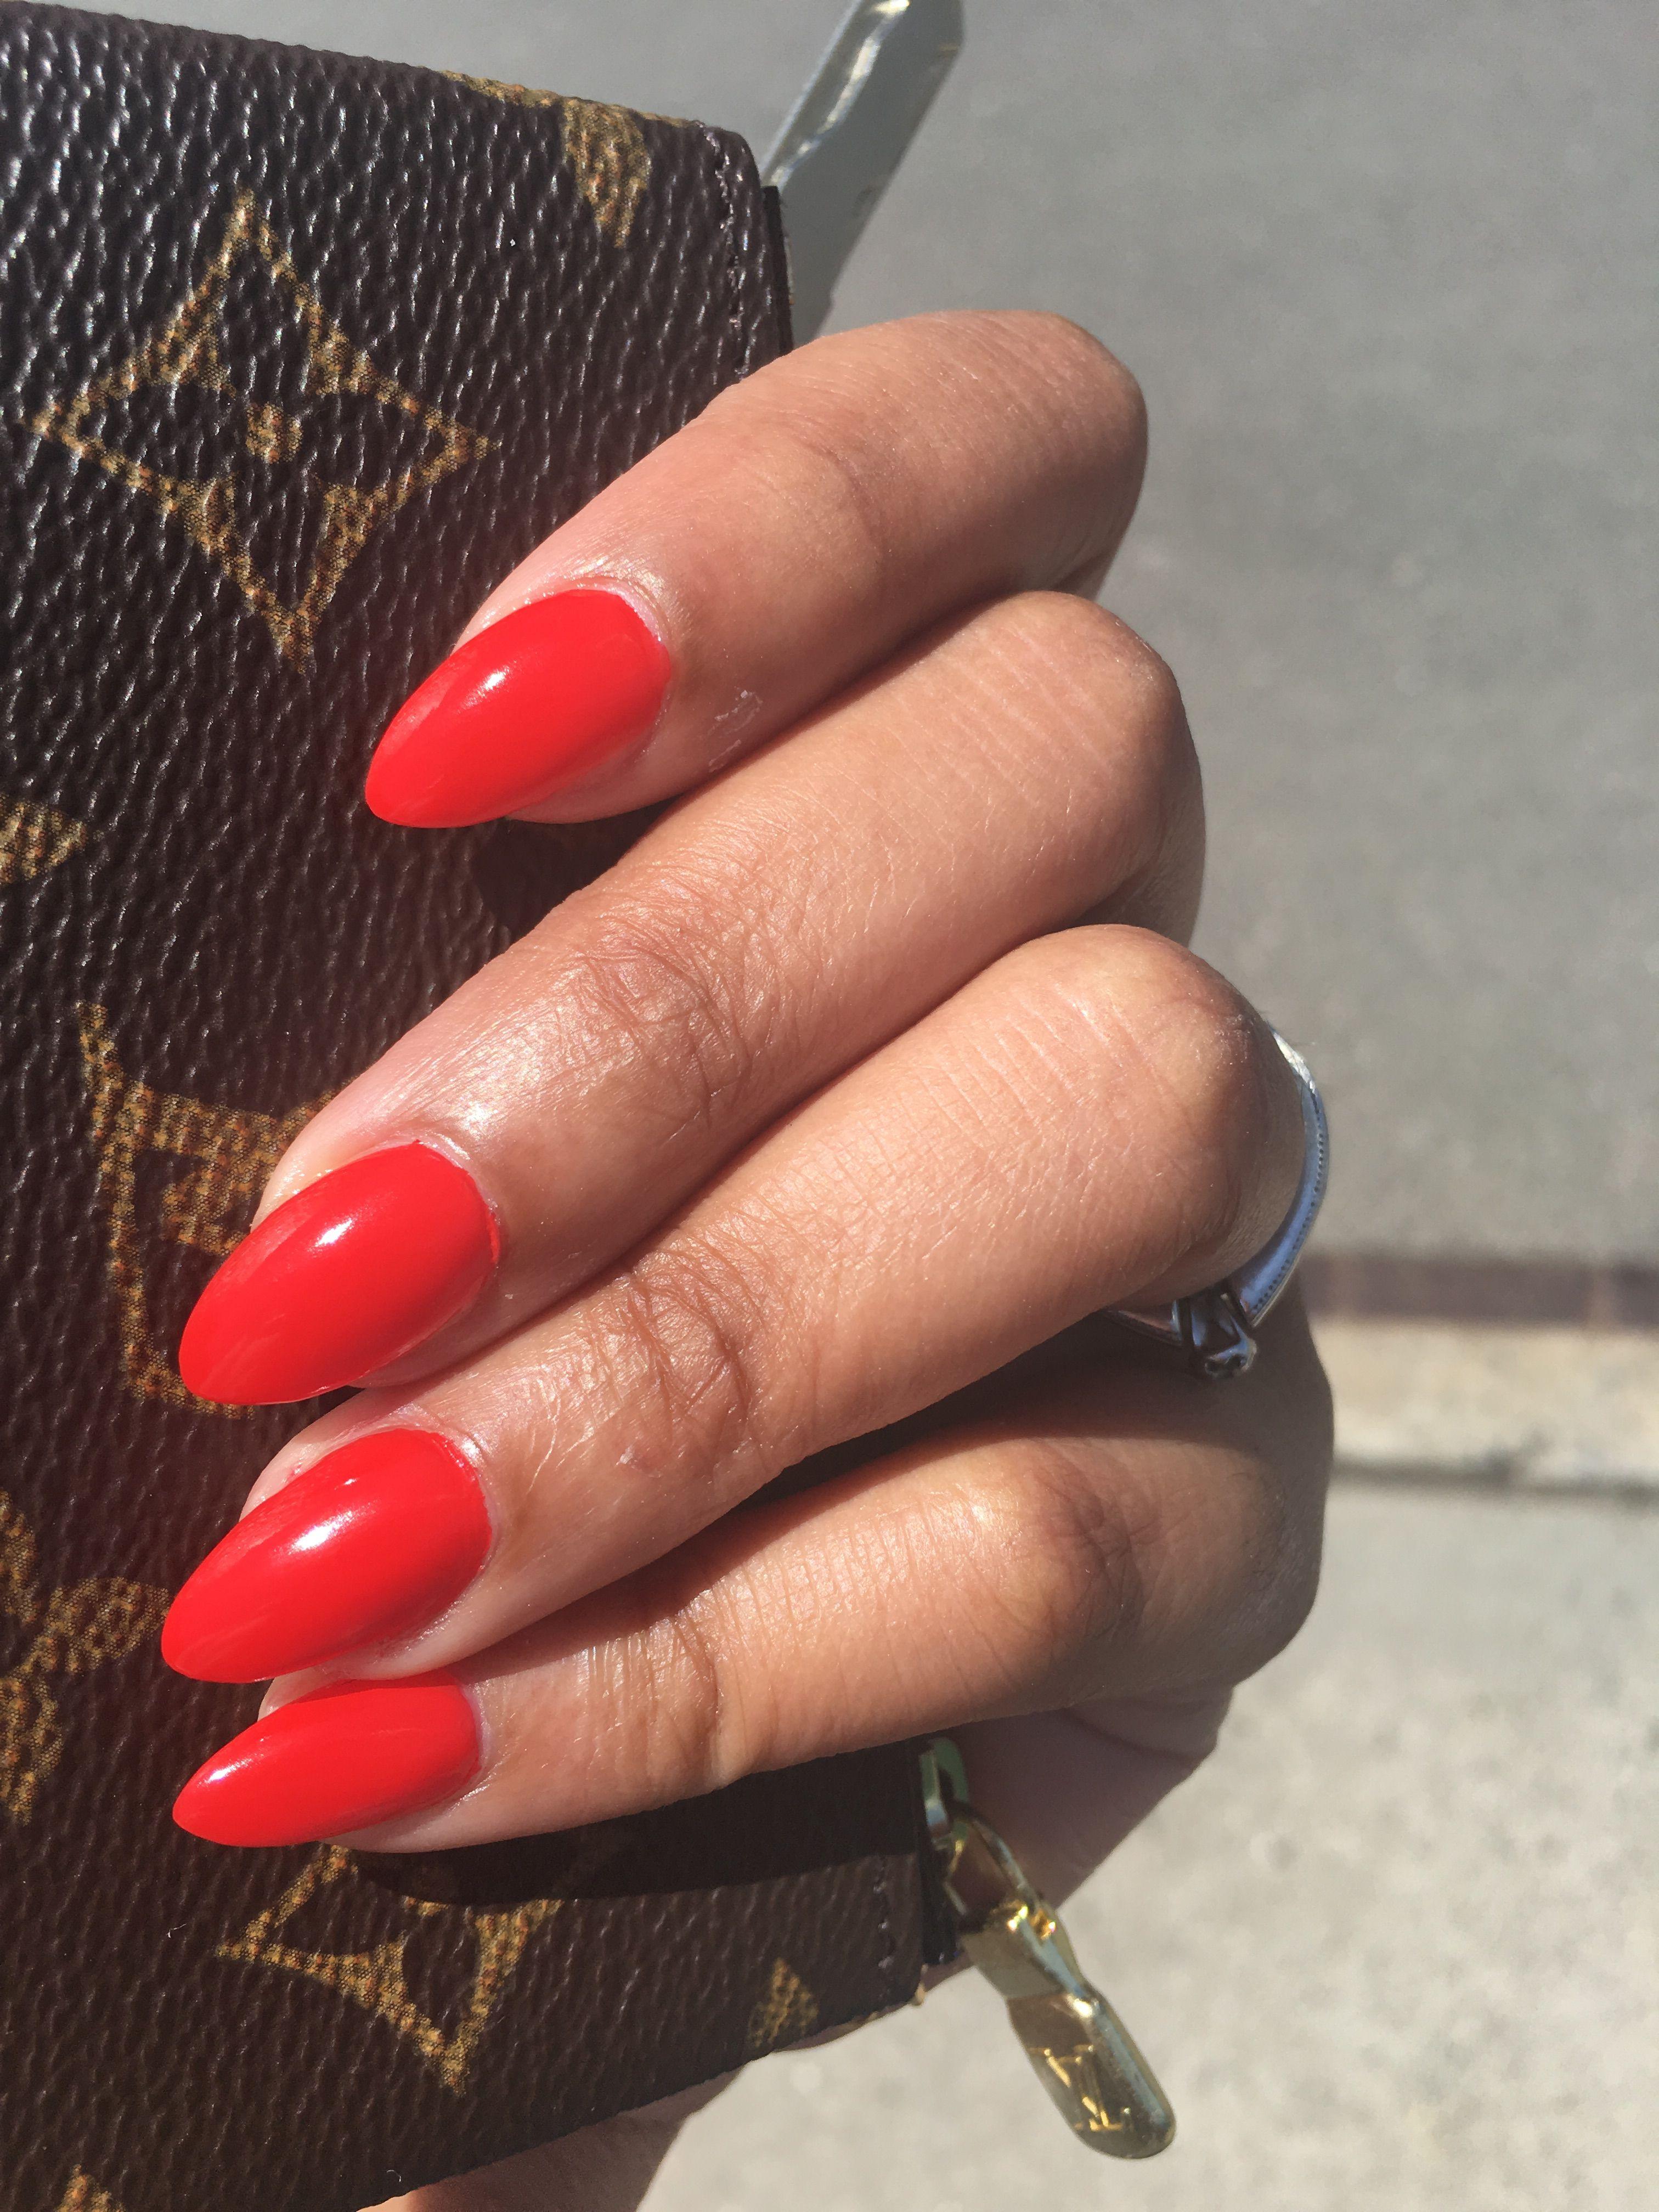 Pin by skylir on nails pinterest nails red nails and nail art